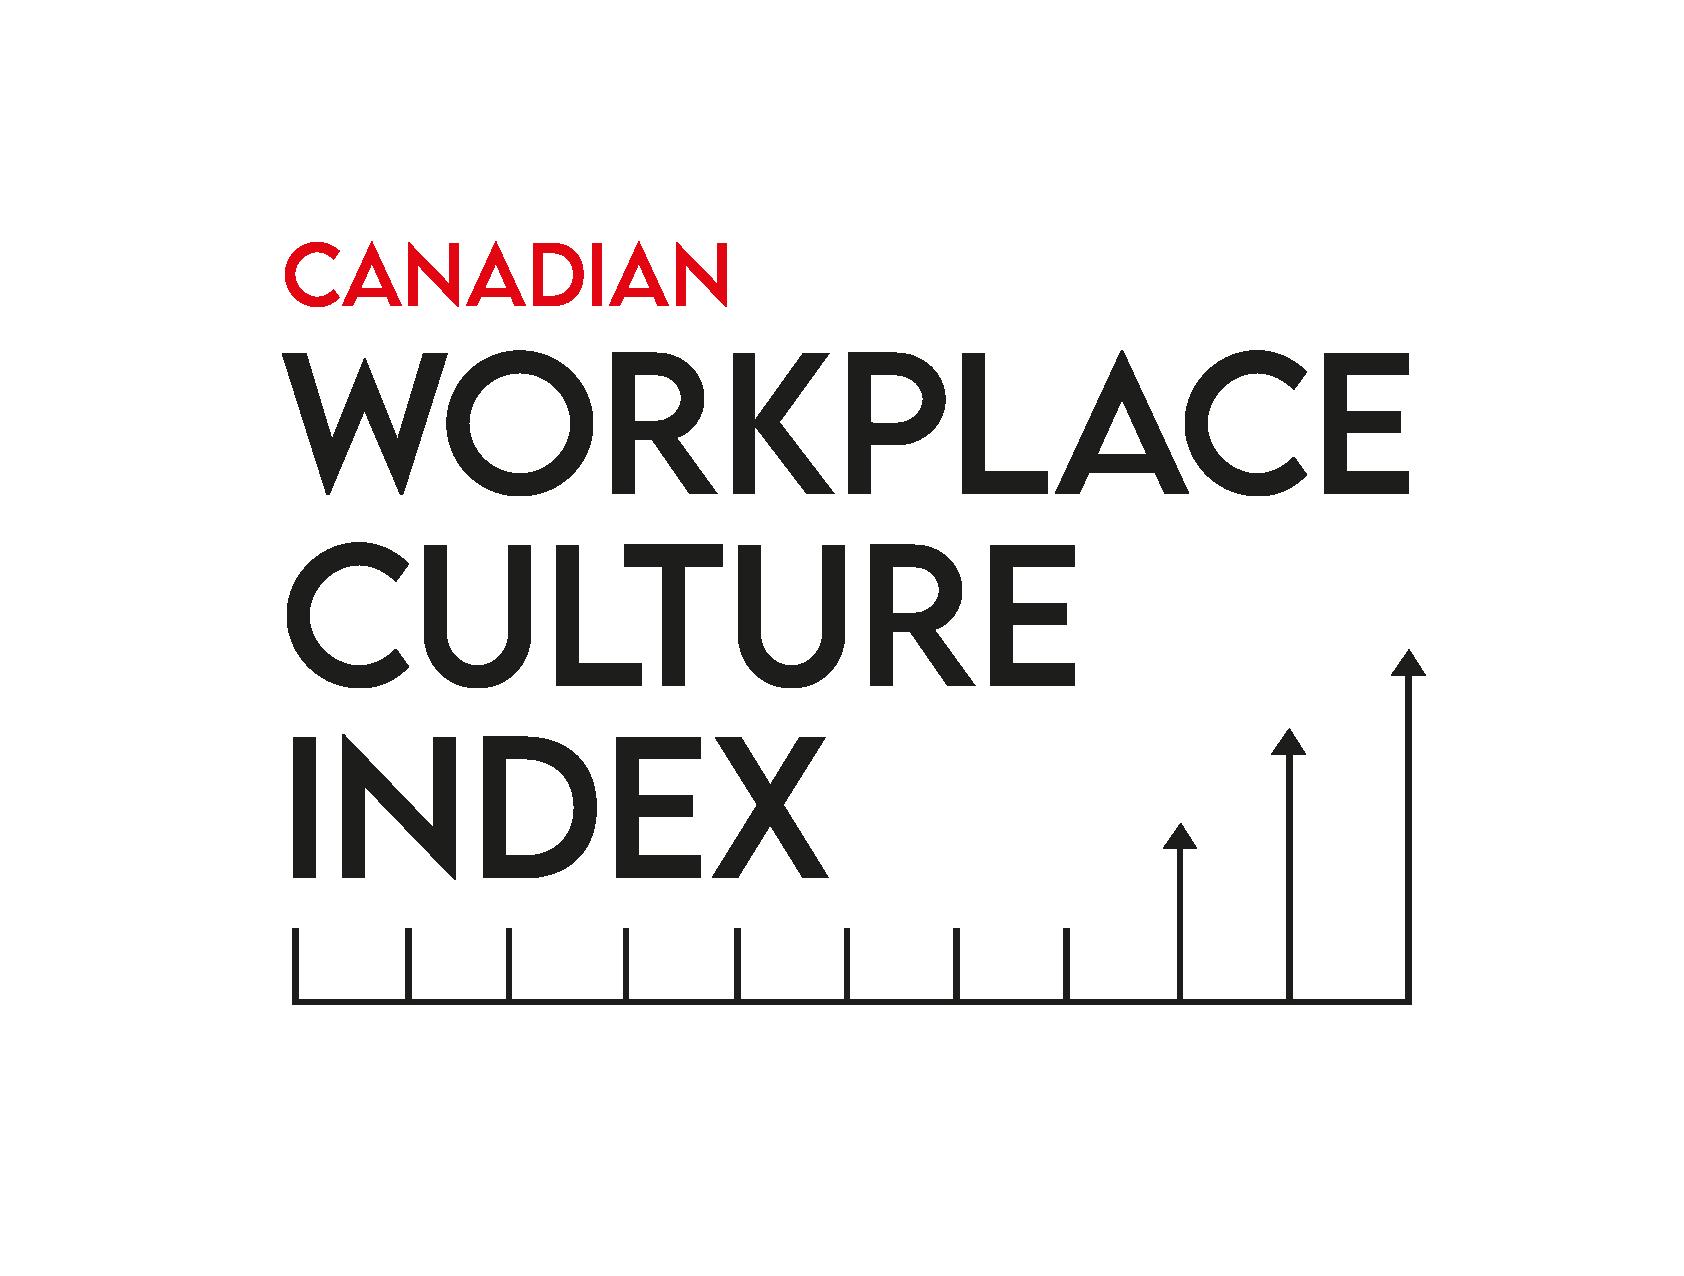 Canadian Workplace Culture Index